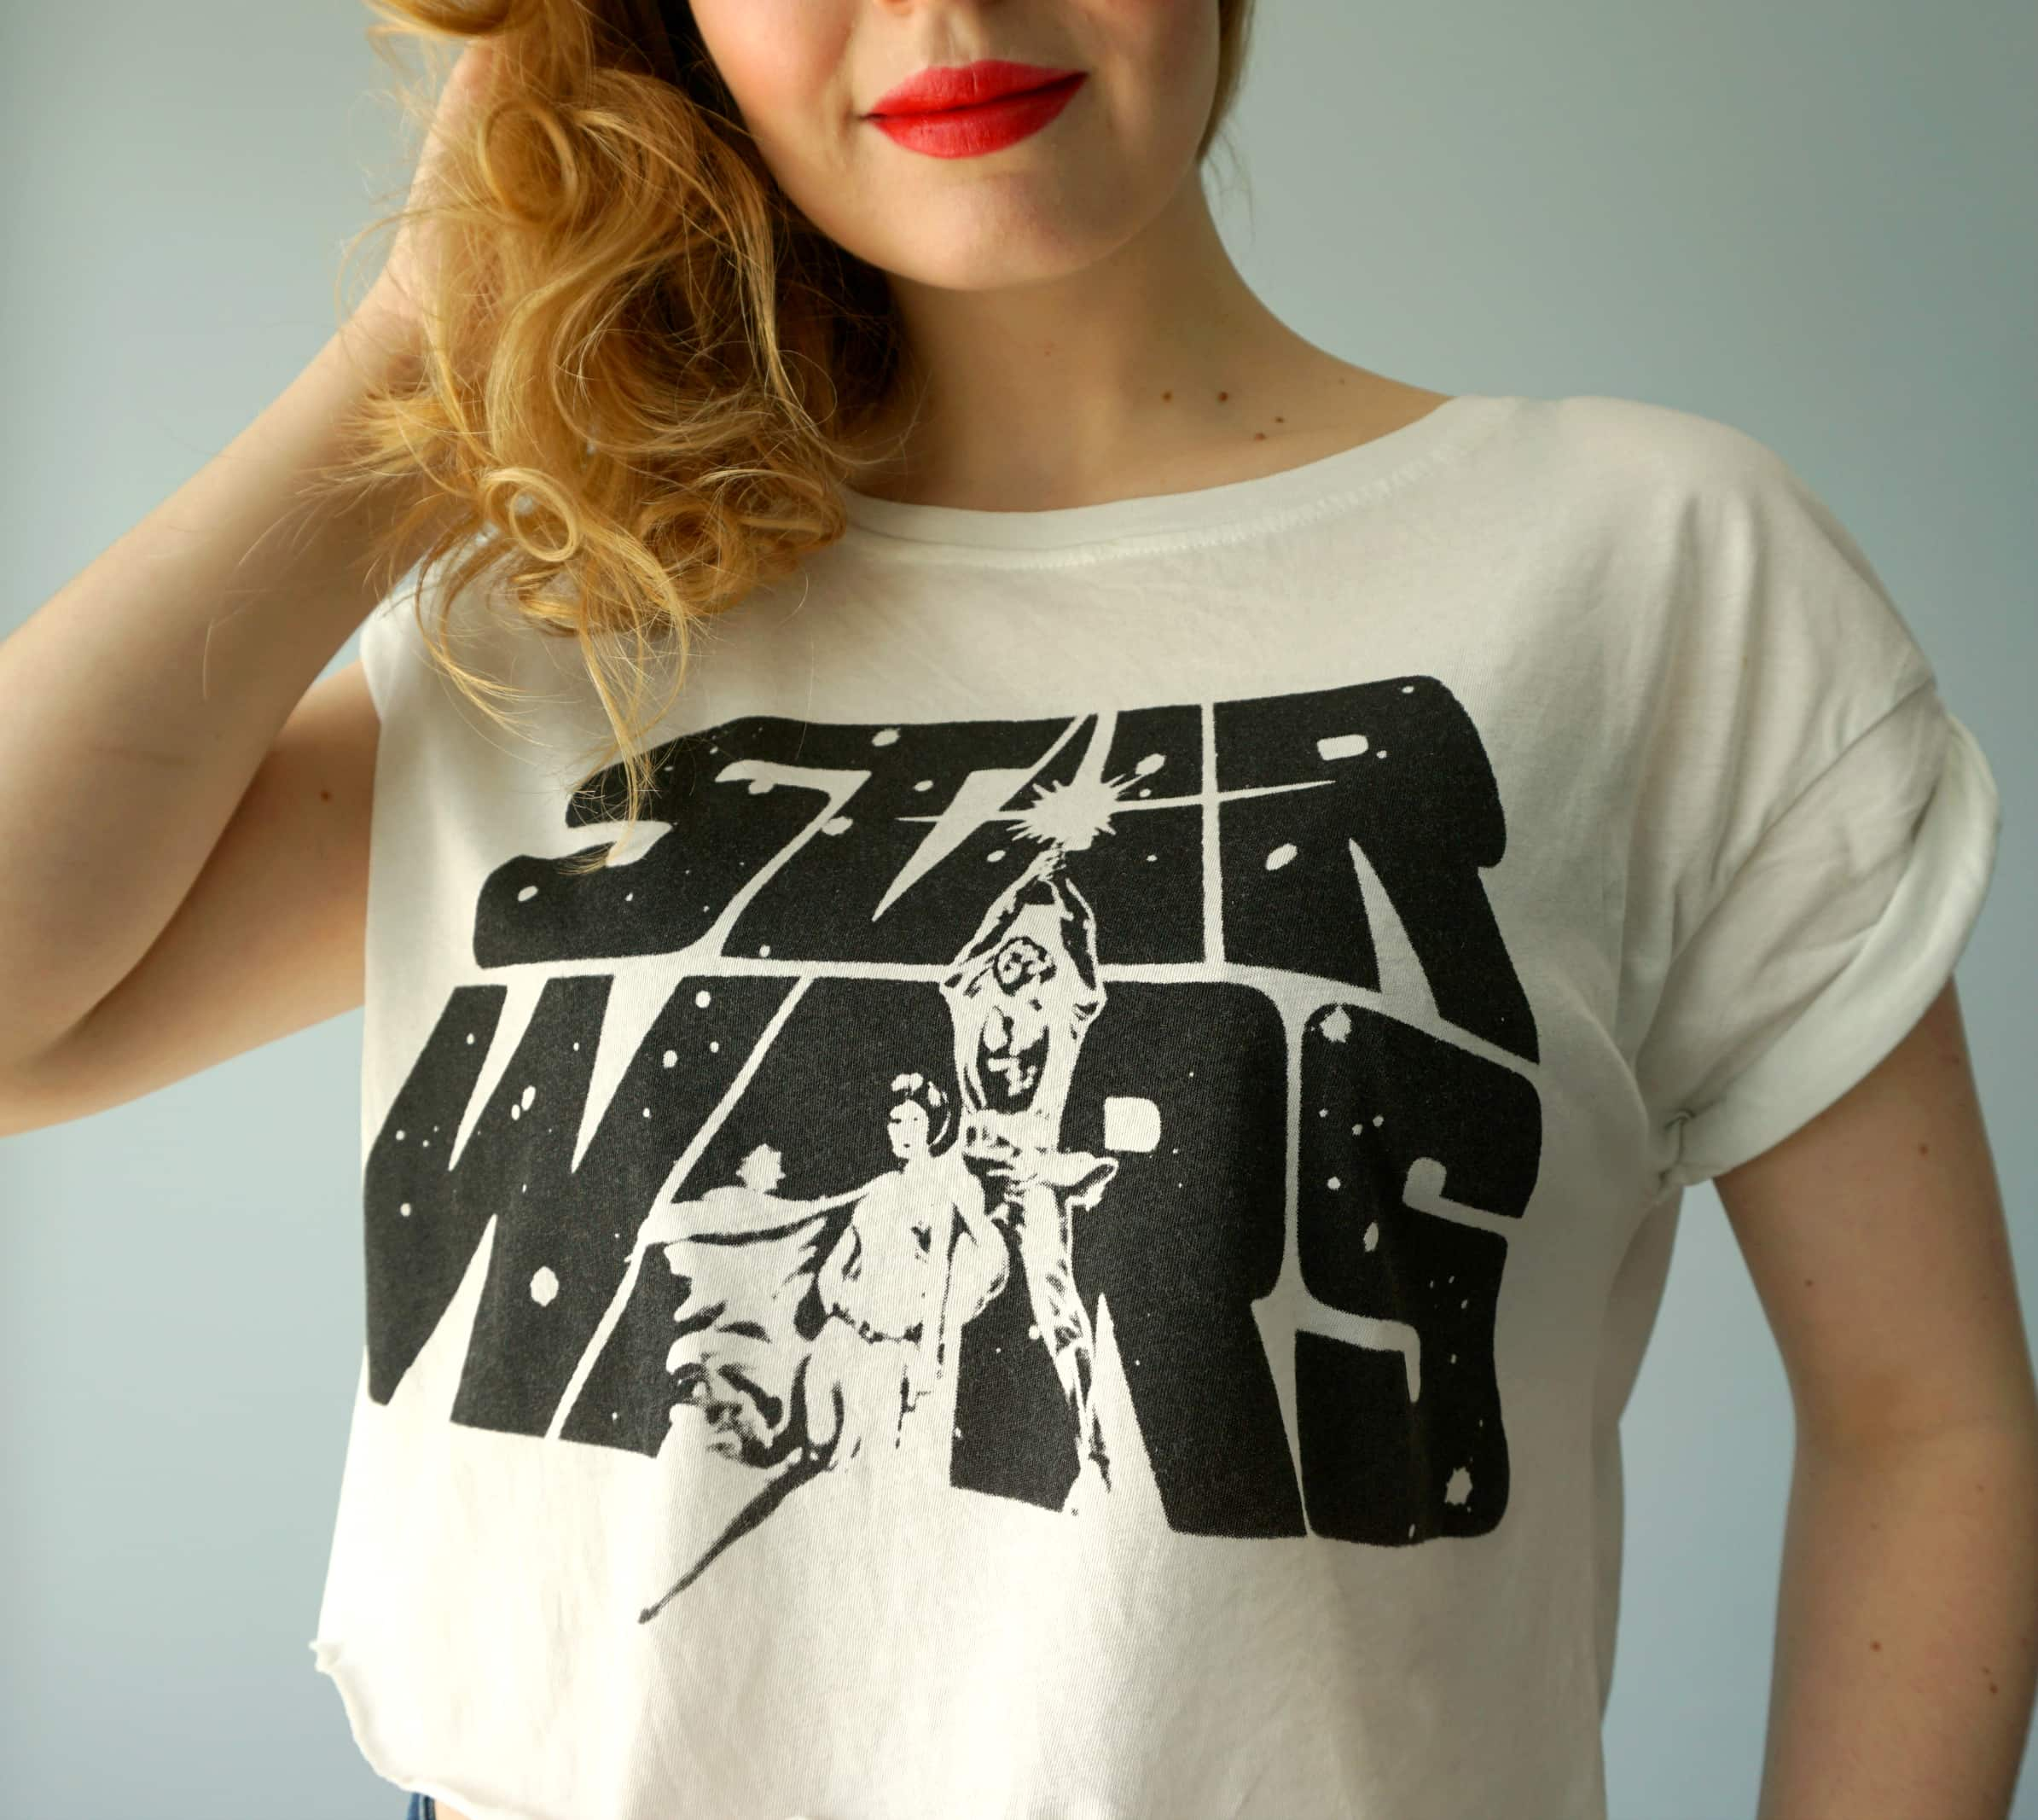 Star Wars Print Shirt DIY   Tutorial by The Makeup Dummy